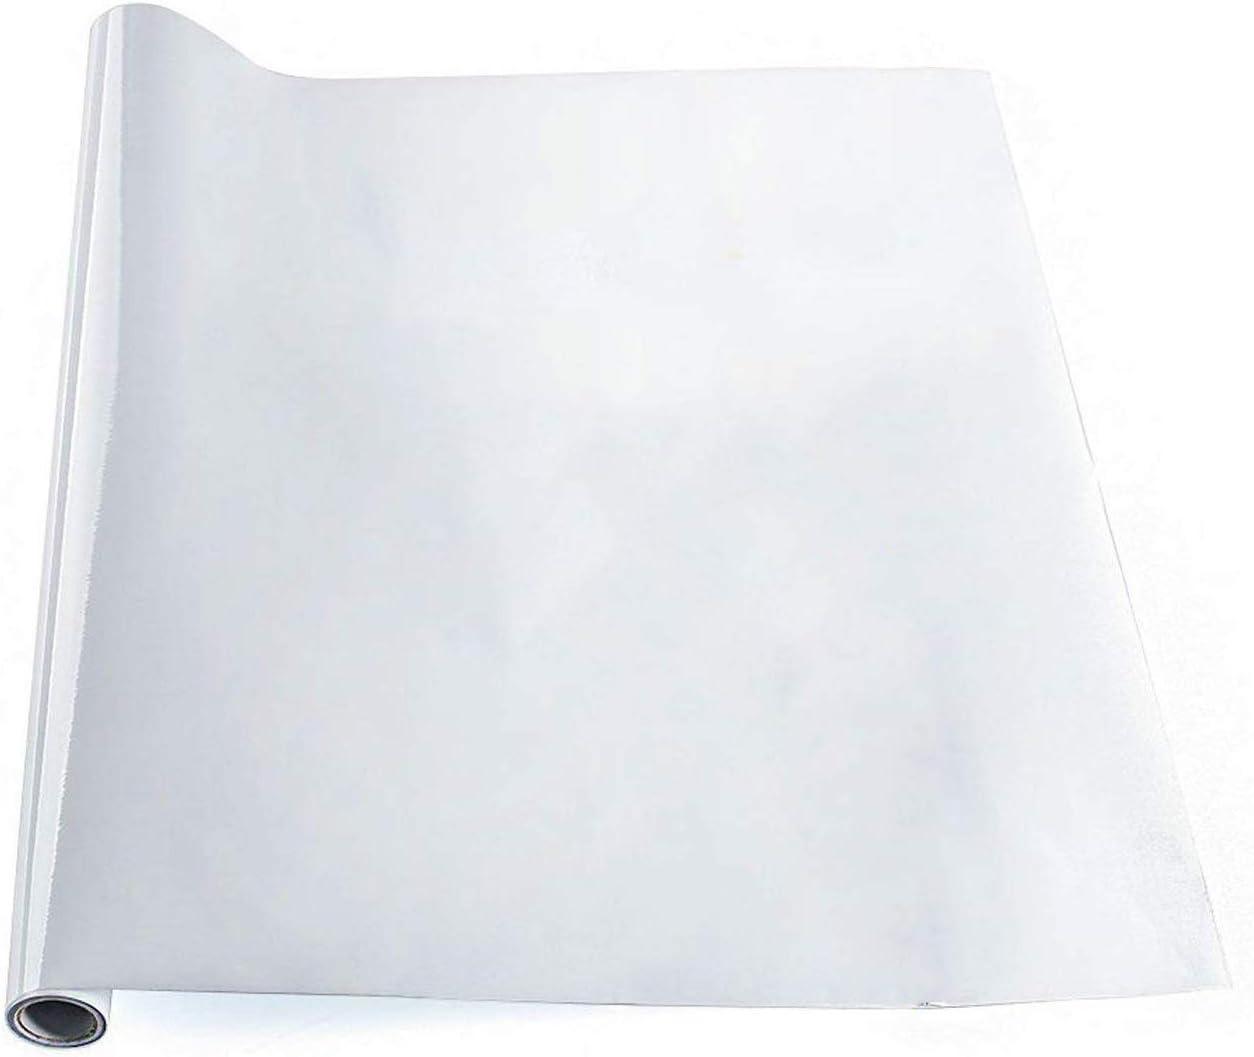 Tafel Tapete EgoEra/® Abnehmbar Tafel Tapete Rolle//Tafel Aufkleber Selbstklebend//Tafelfolie Selbstklebend f/ür Zuhause Schule /& B/üro Wei/ß 60 * 200cm